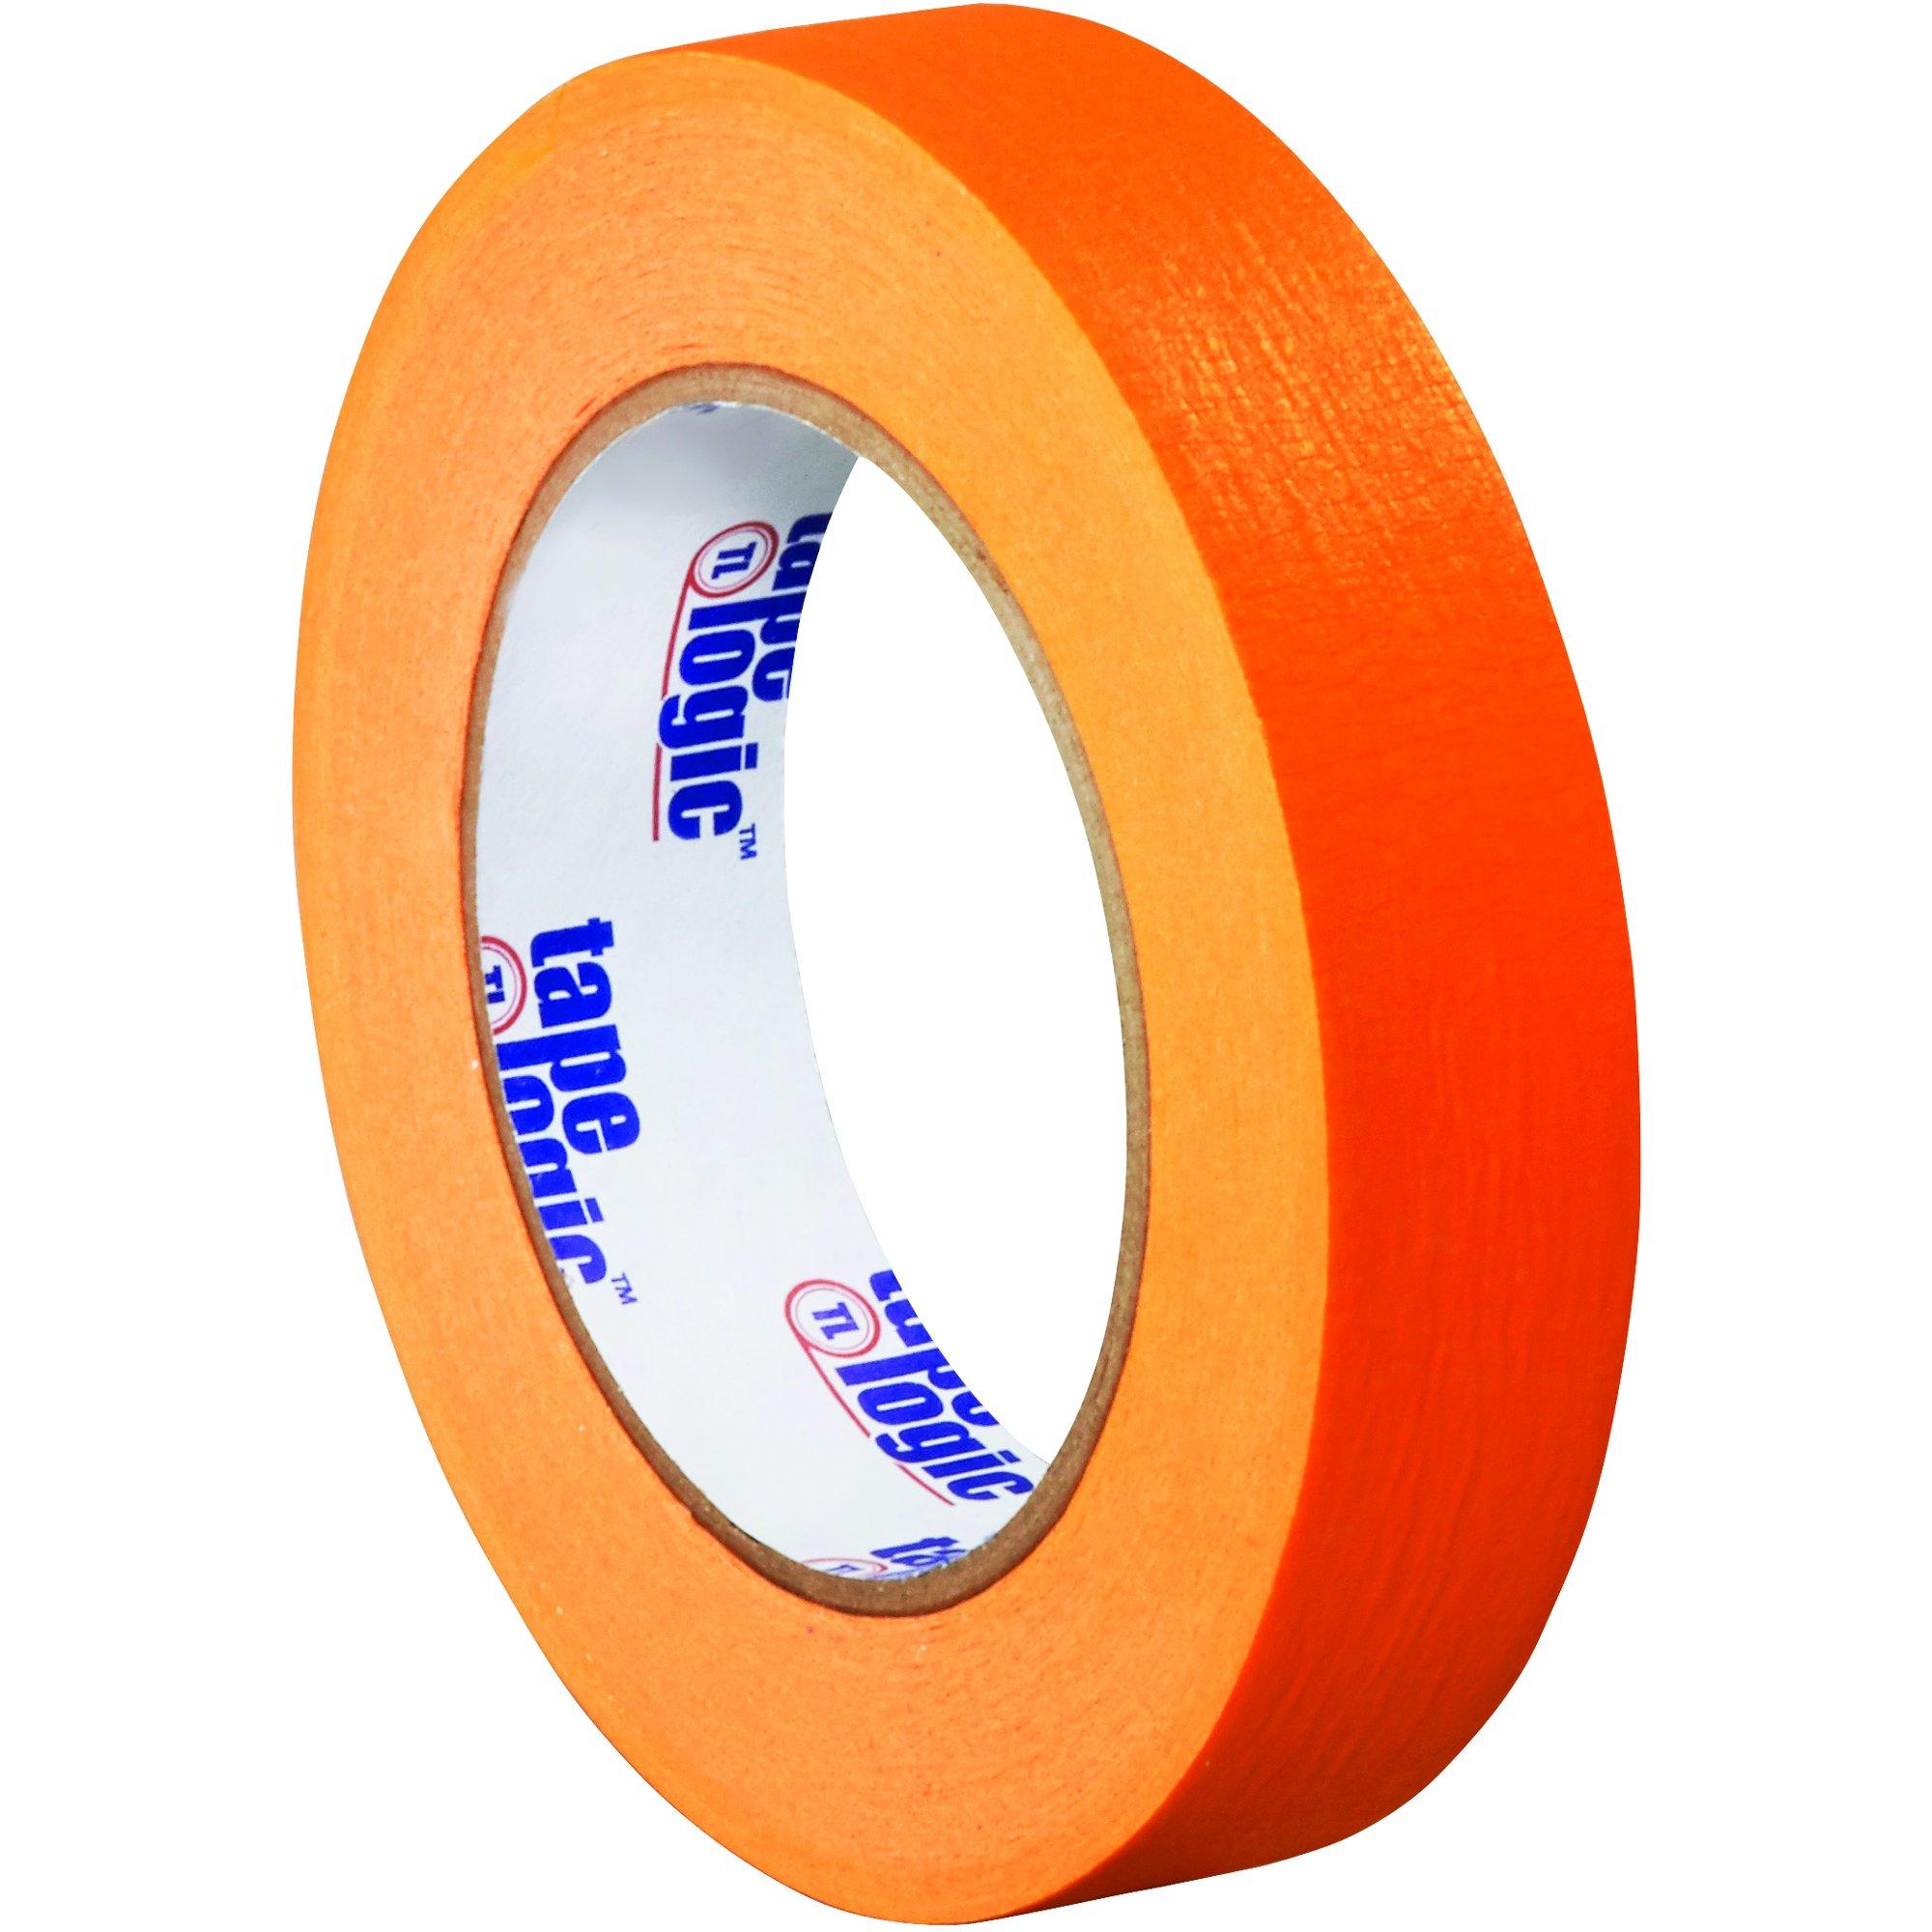 BOX USA BT93500312PKD Tape Logic Masking Tape, 1'' x 60 yd., Orange (Pack of 12)